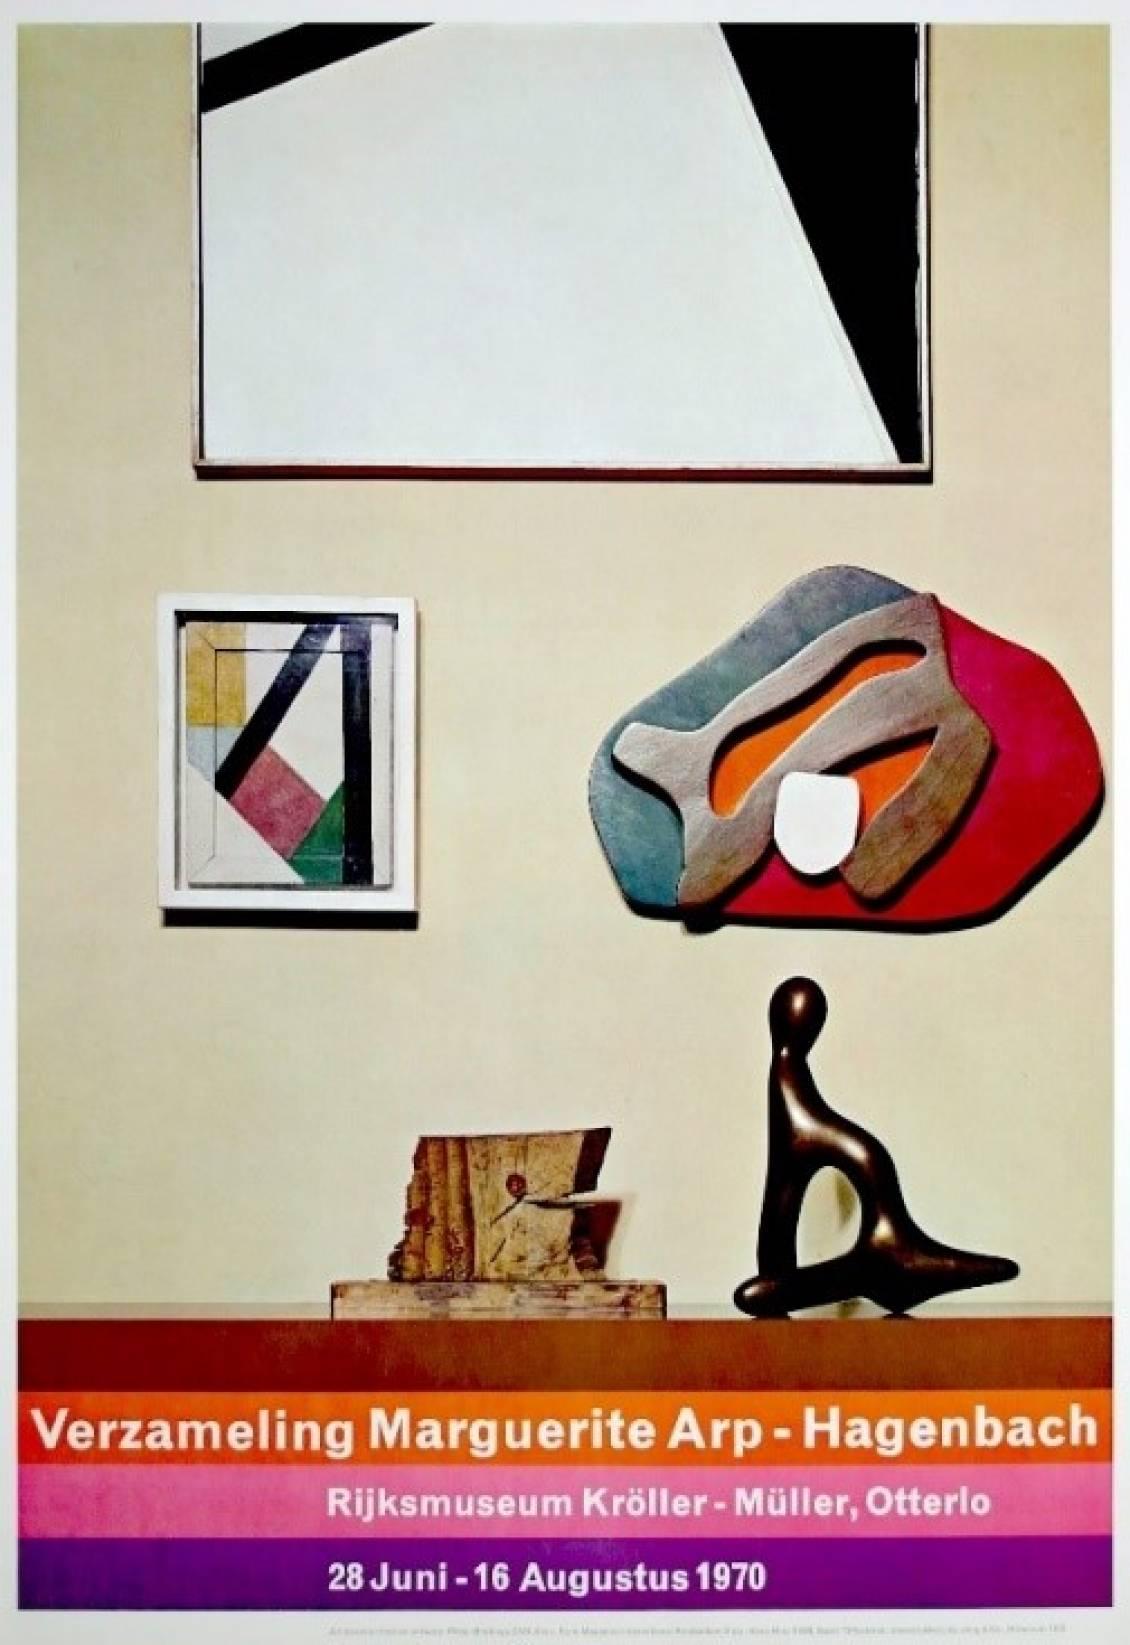 Poster Verzameling Marguerite Arp-Hagenbach, 1970